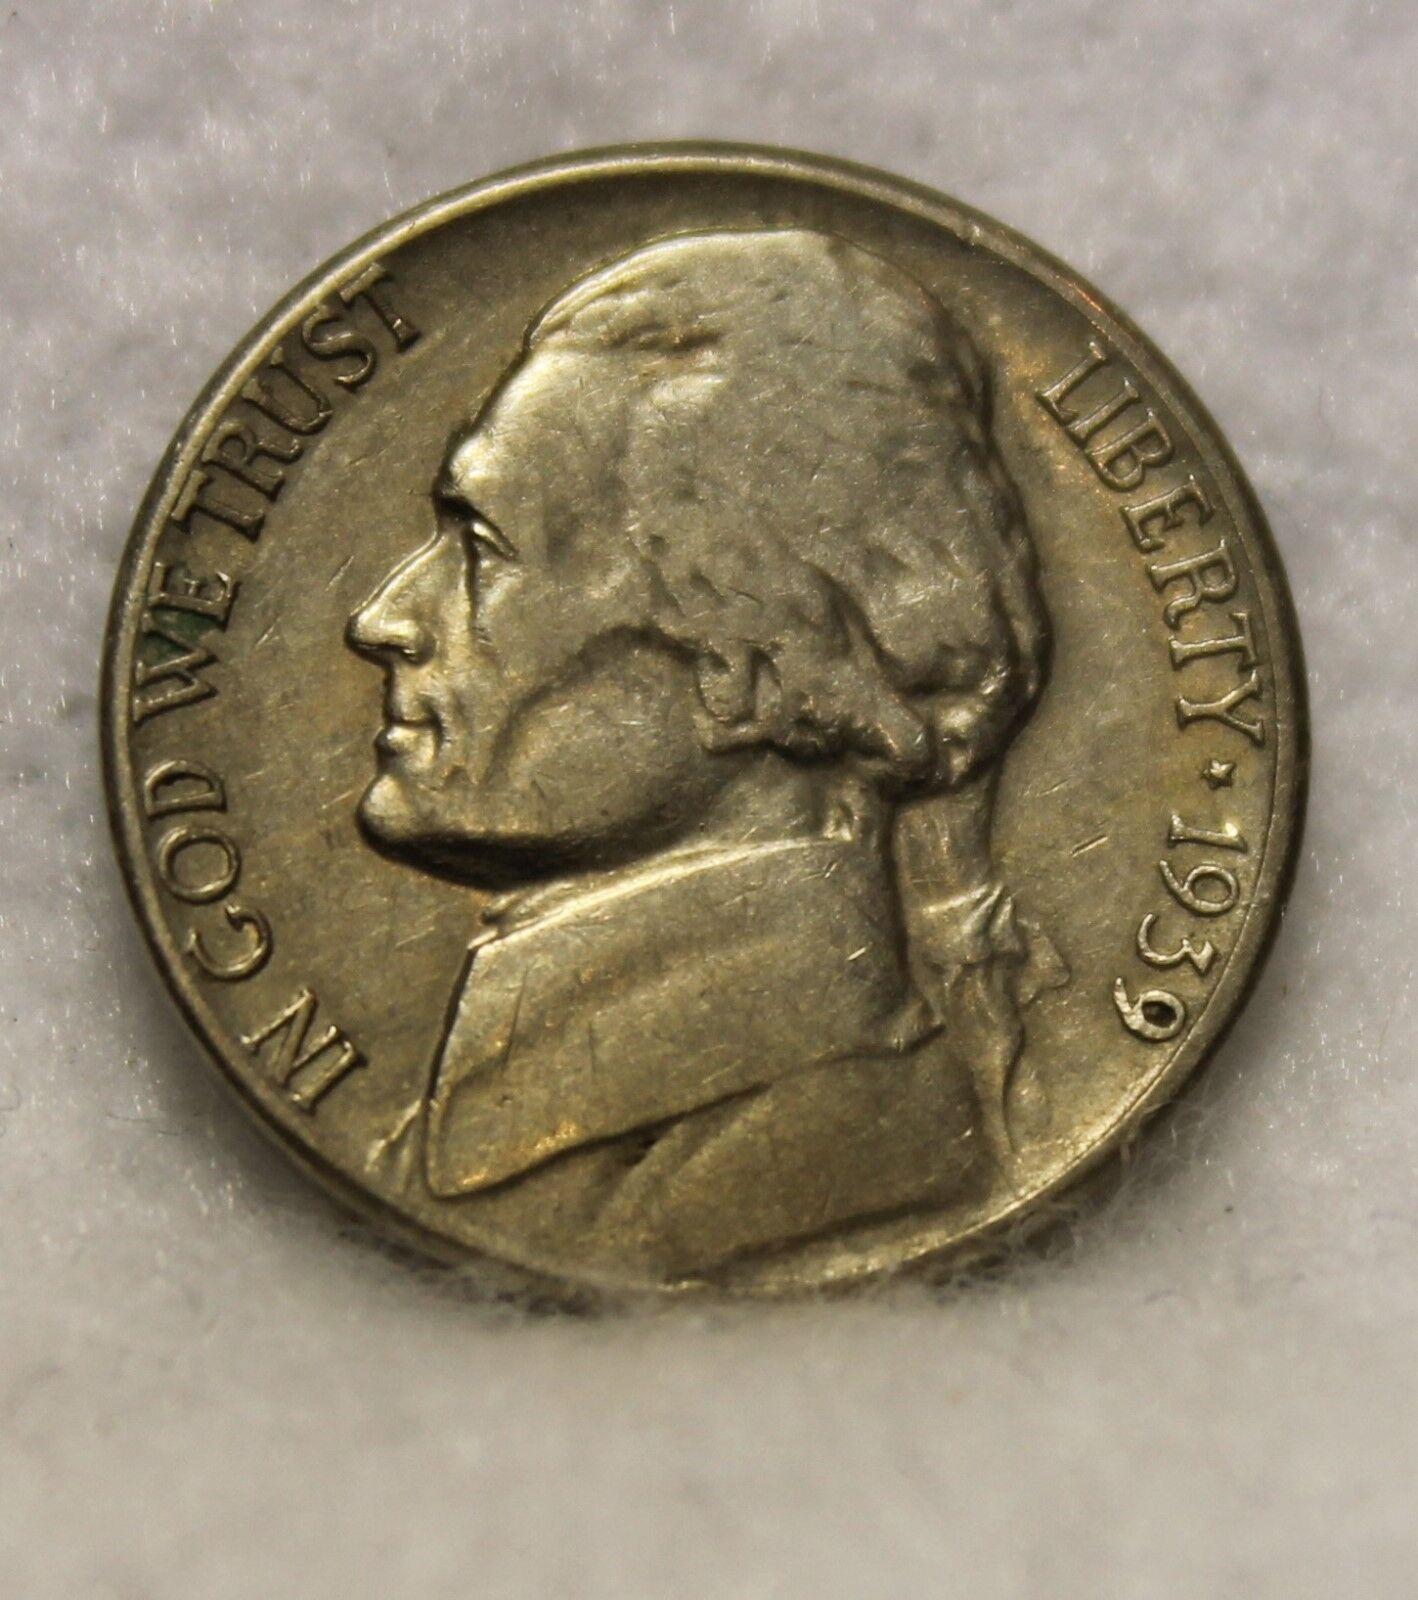 1939S Jefferson Nickel - $5.50